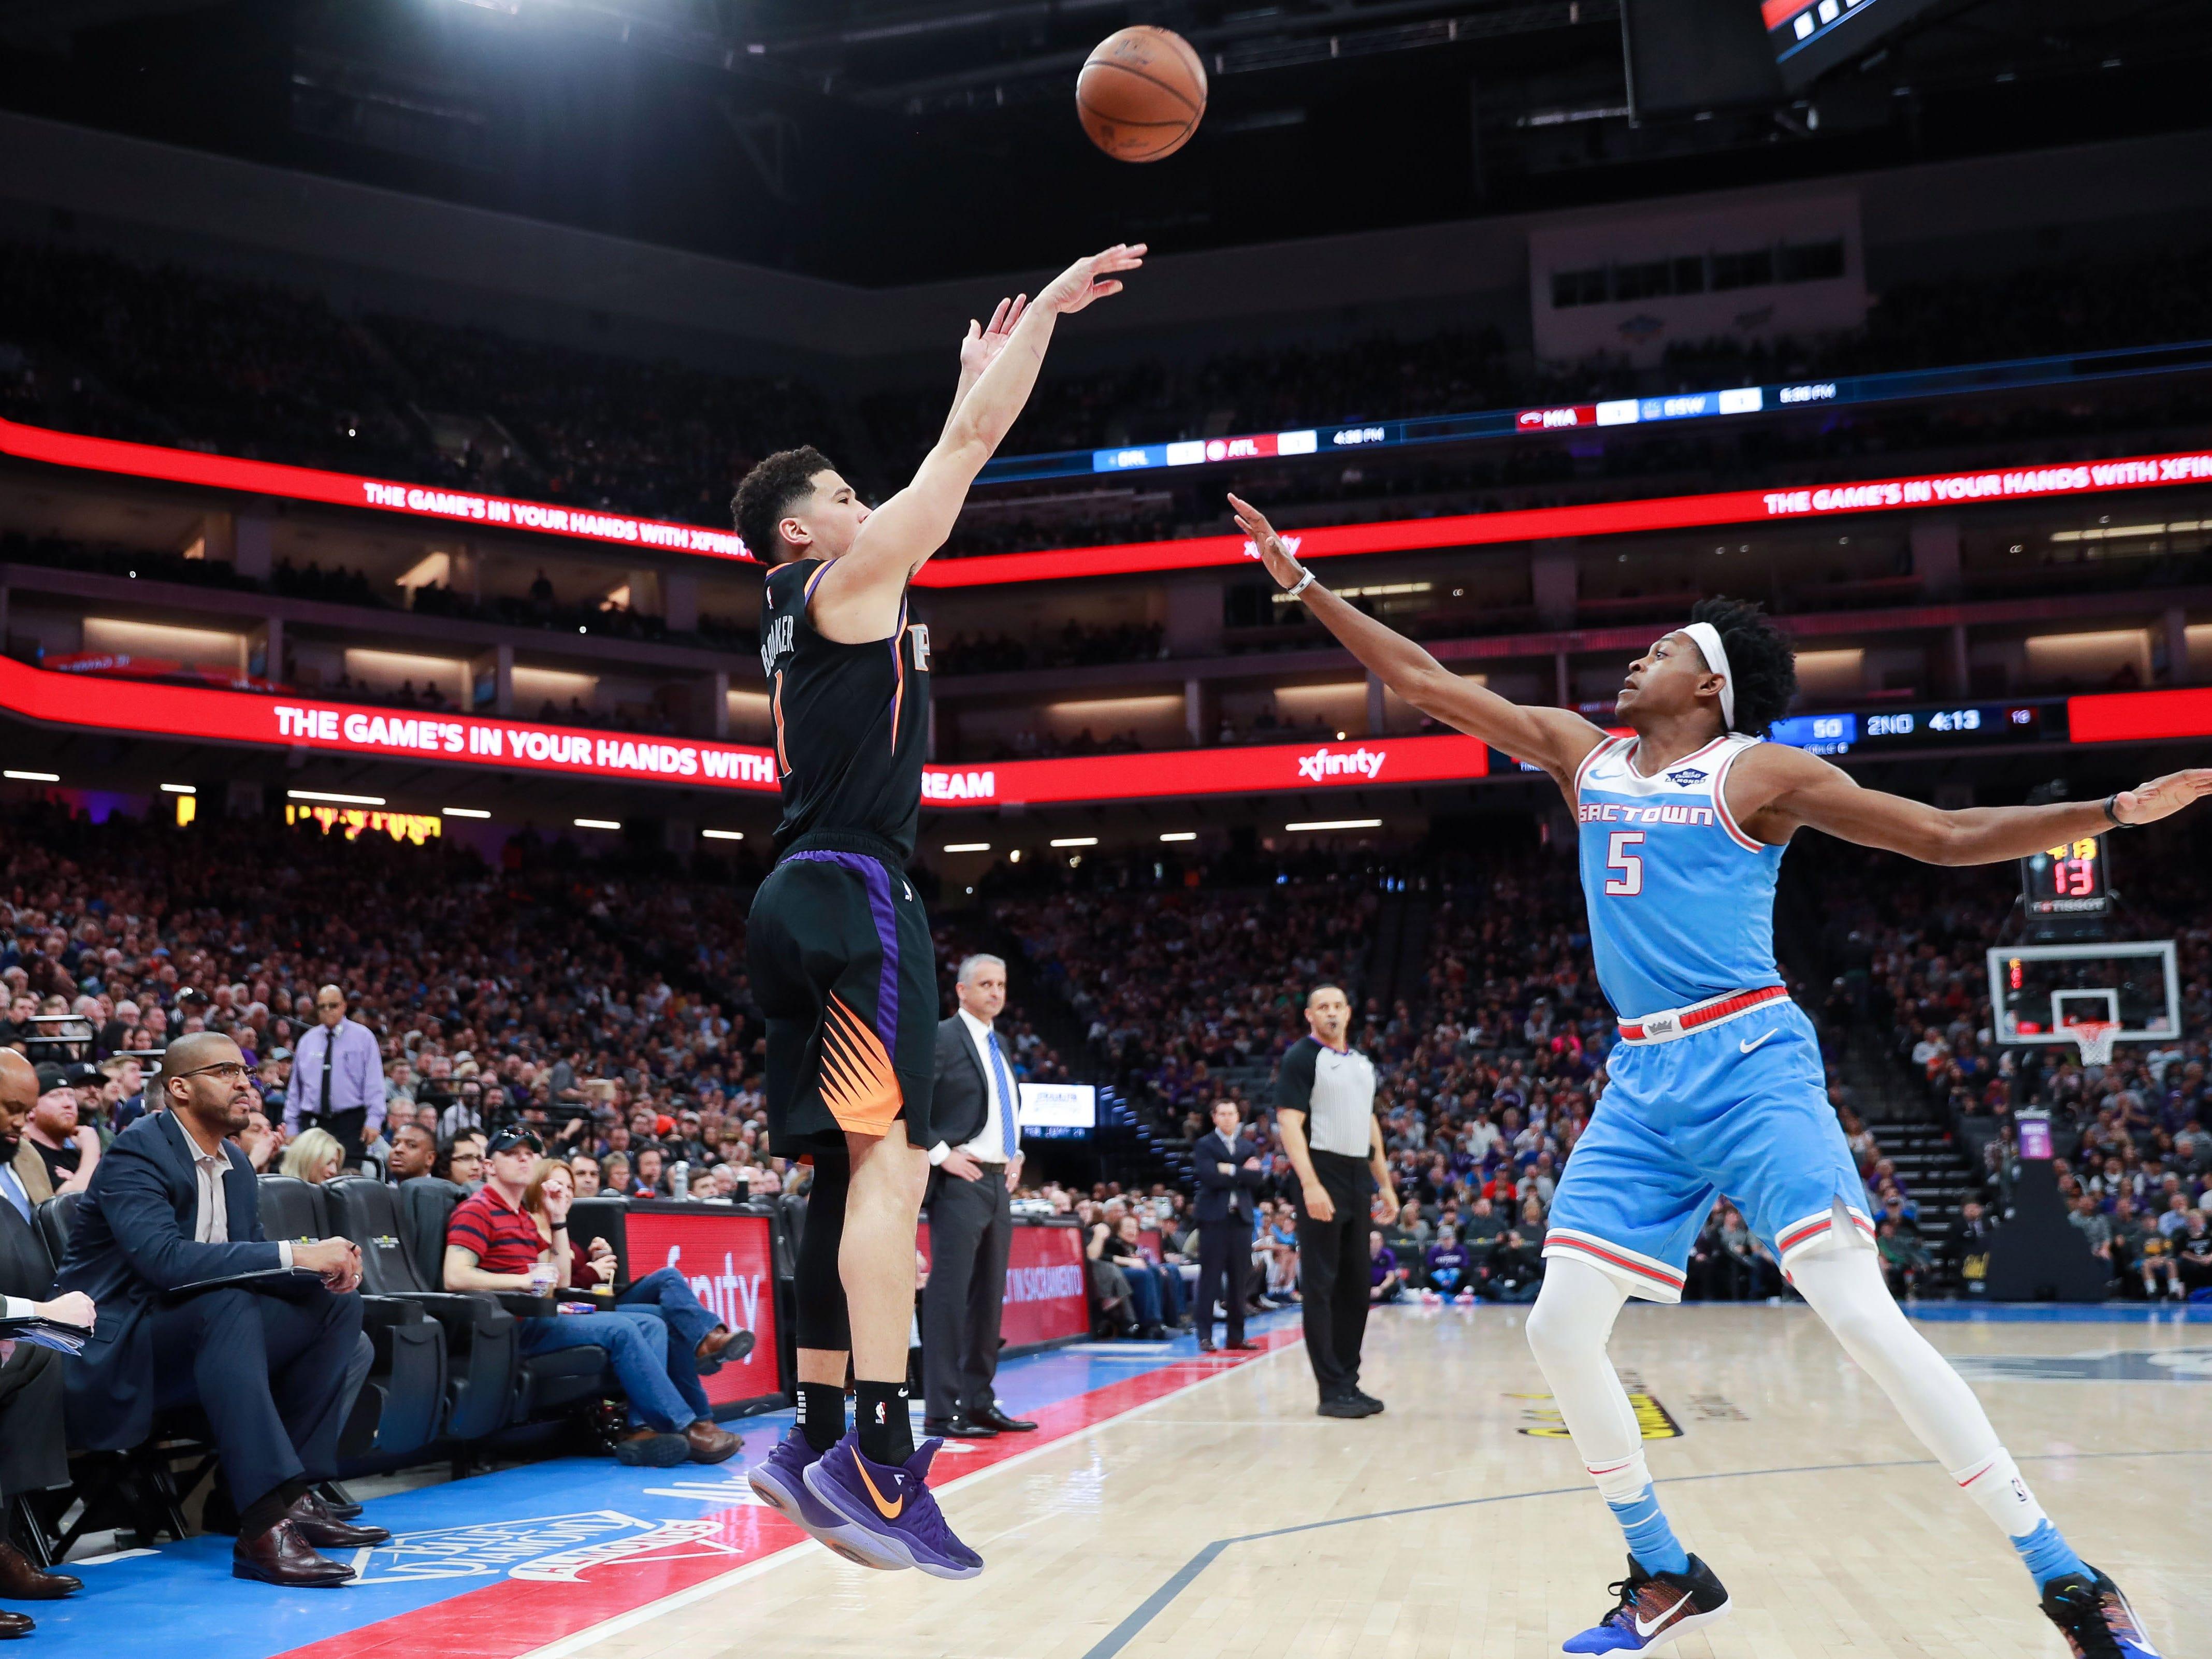 Feb 10, 2019; Sacramento, CA, USA; Phoenix Suns guard Devin Booker (1) shoots the ball over Sacramento Kings guard De'Aaron Fox (5) during the second quarter at Golden 1 Center.